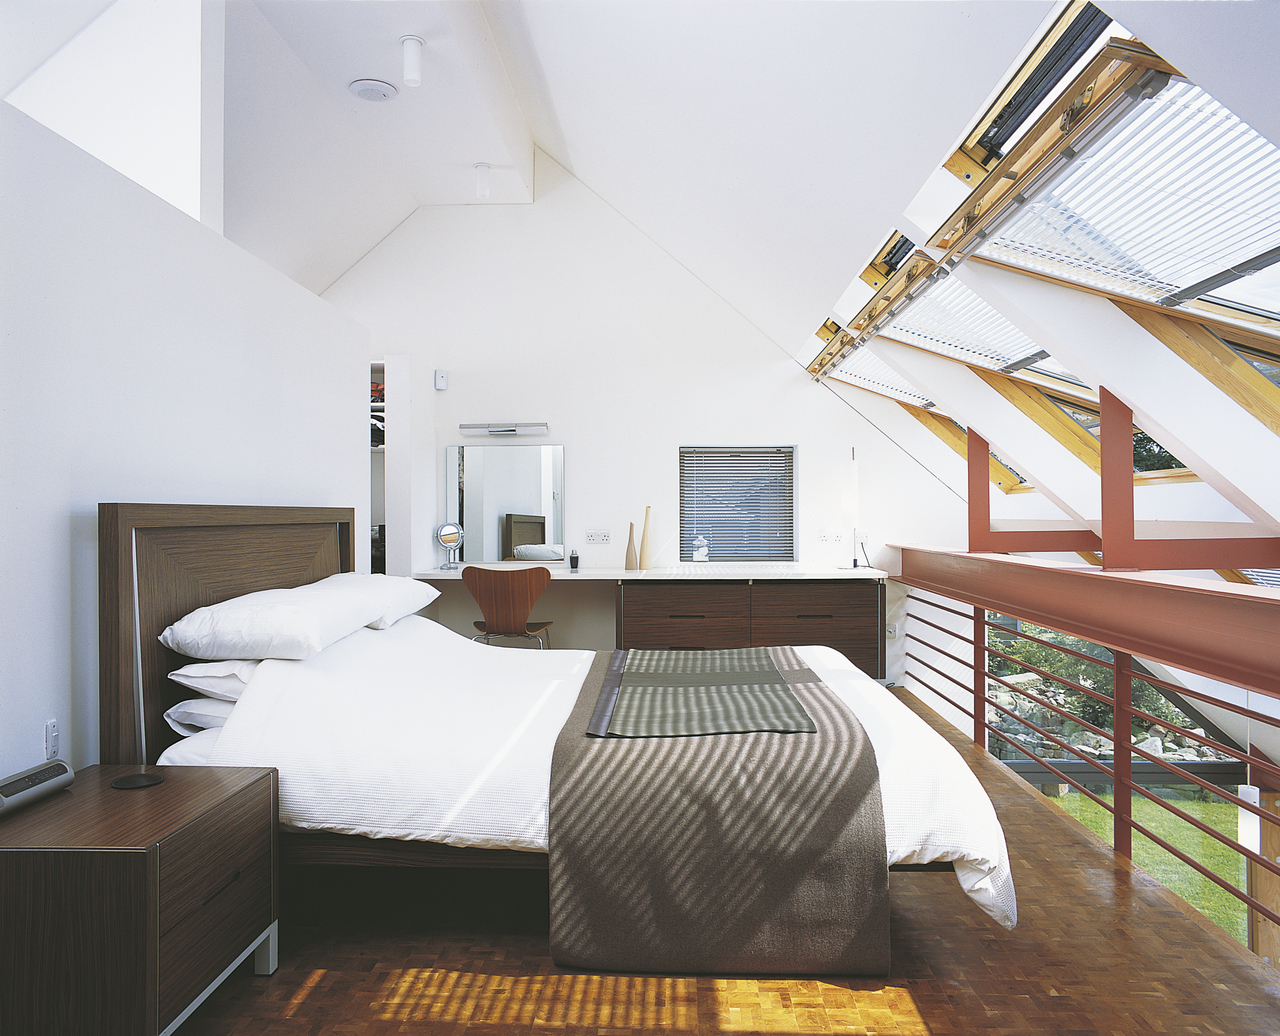 4 am nagements insolites dans les combles r ve de combles. Black Bedroom Furniture Sets. Home Design Ideas